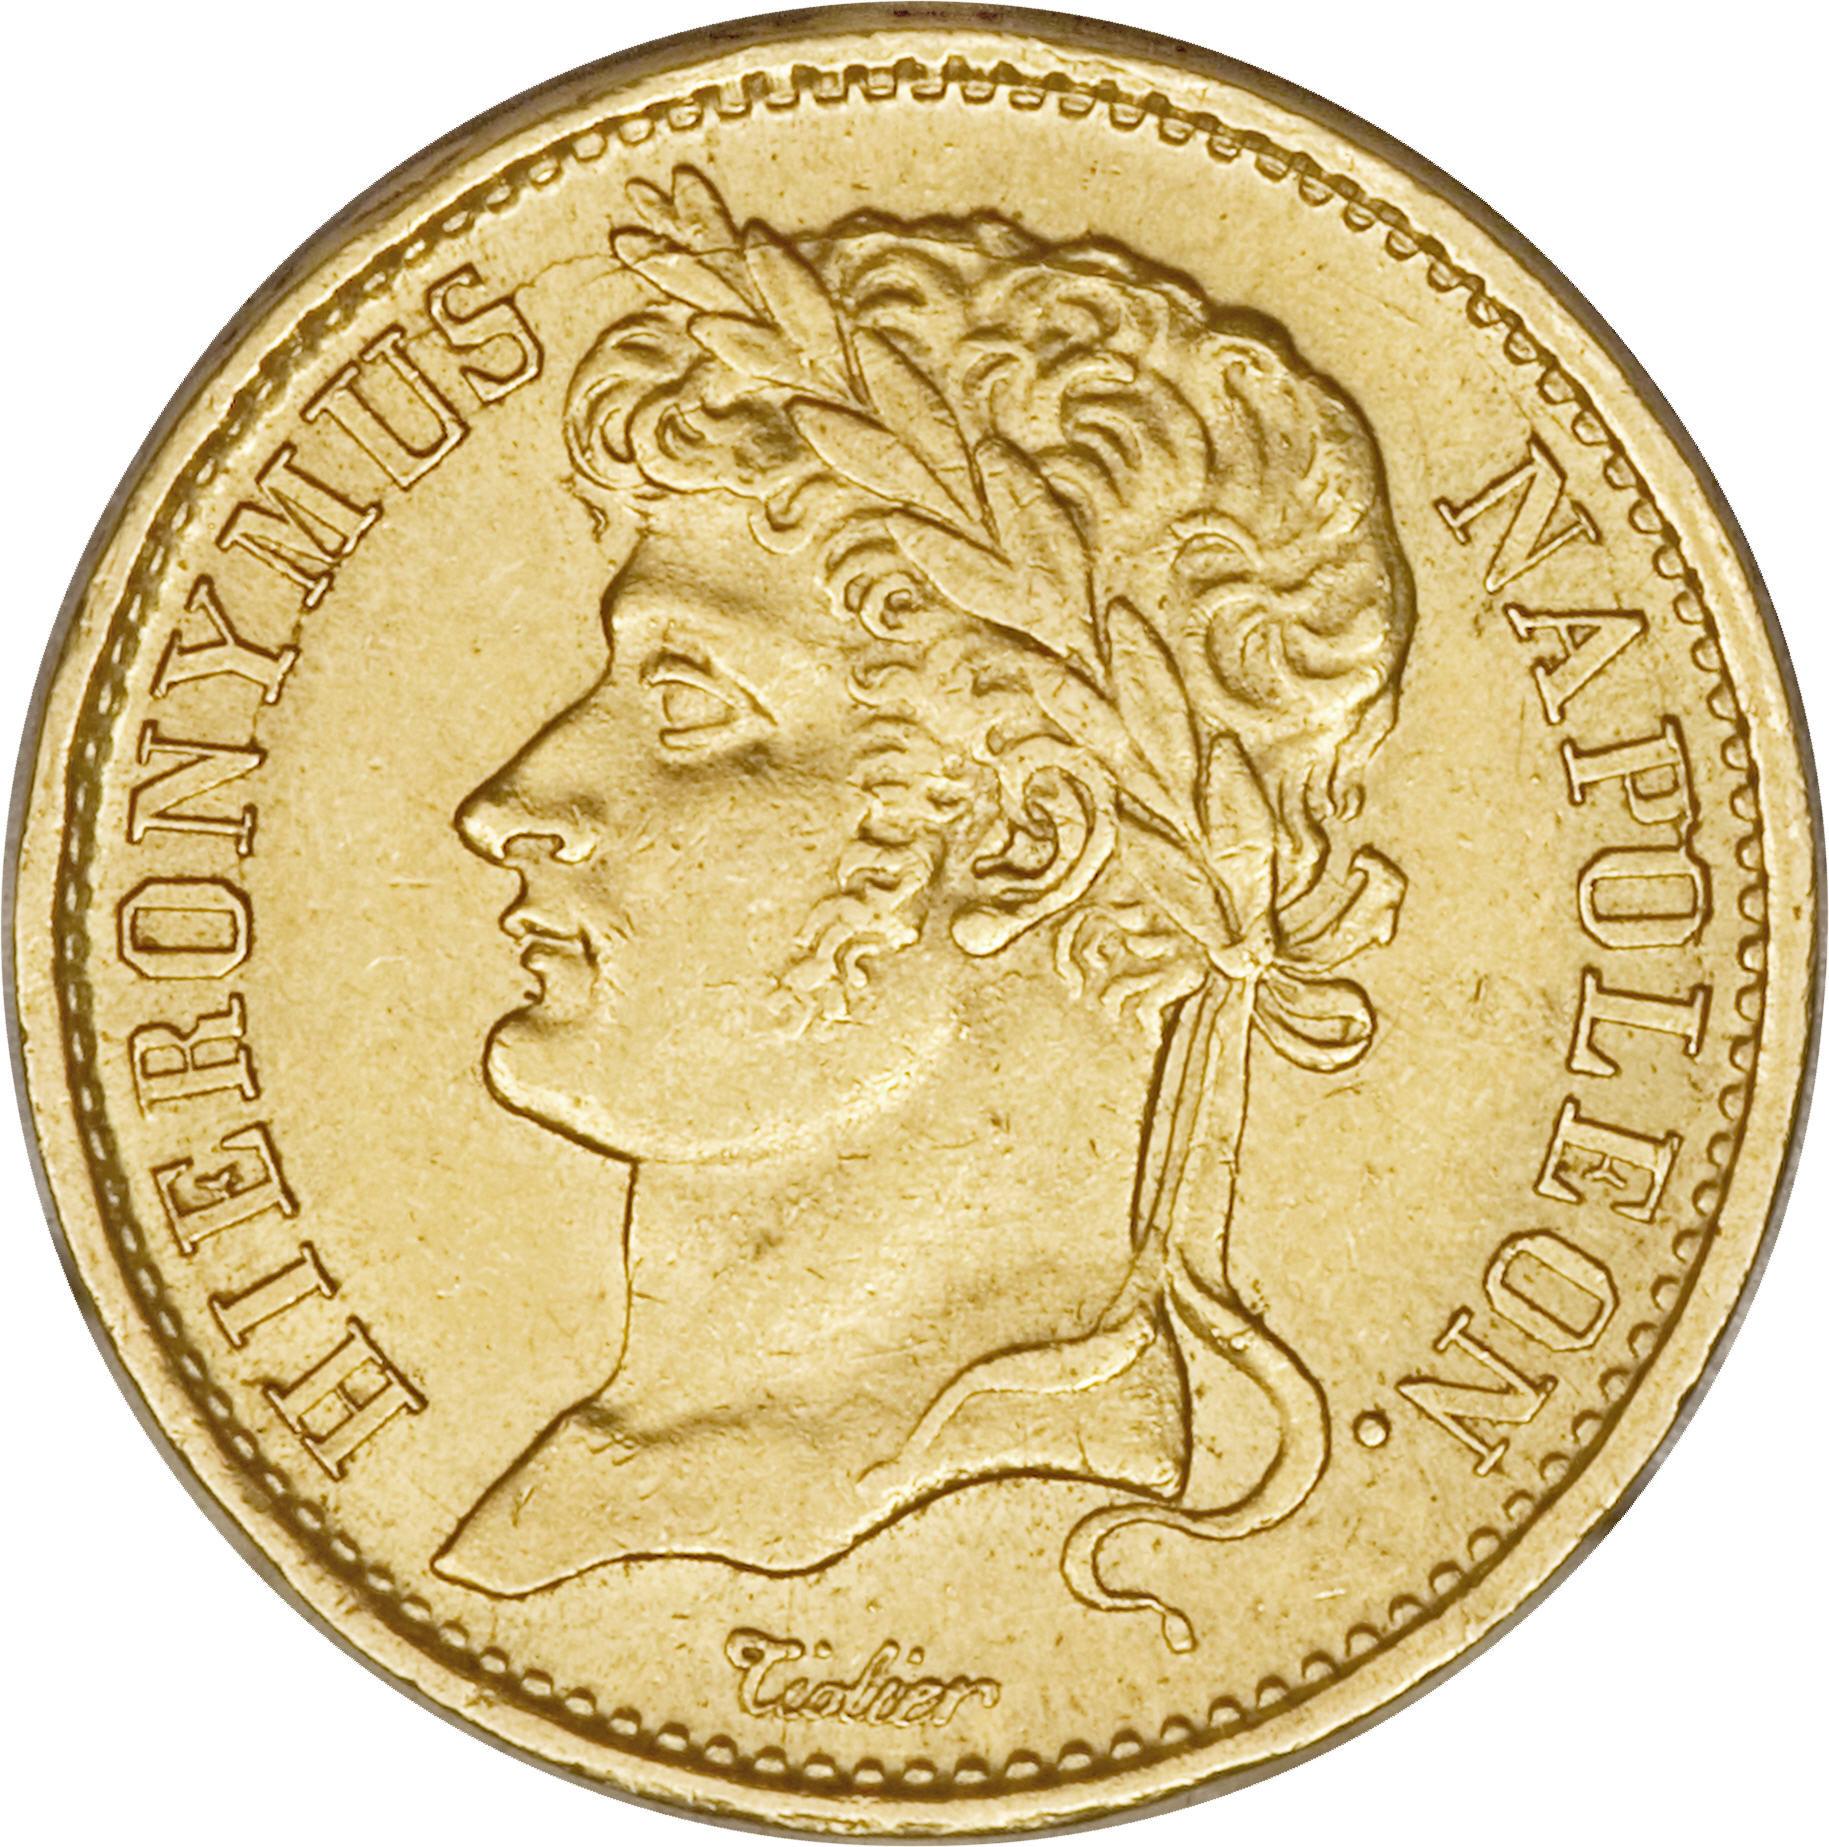 The Westphalian Coinage of Jerome I